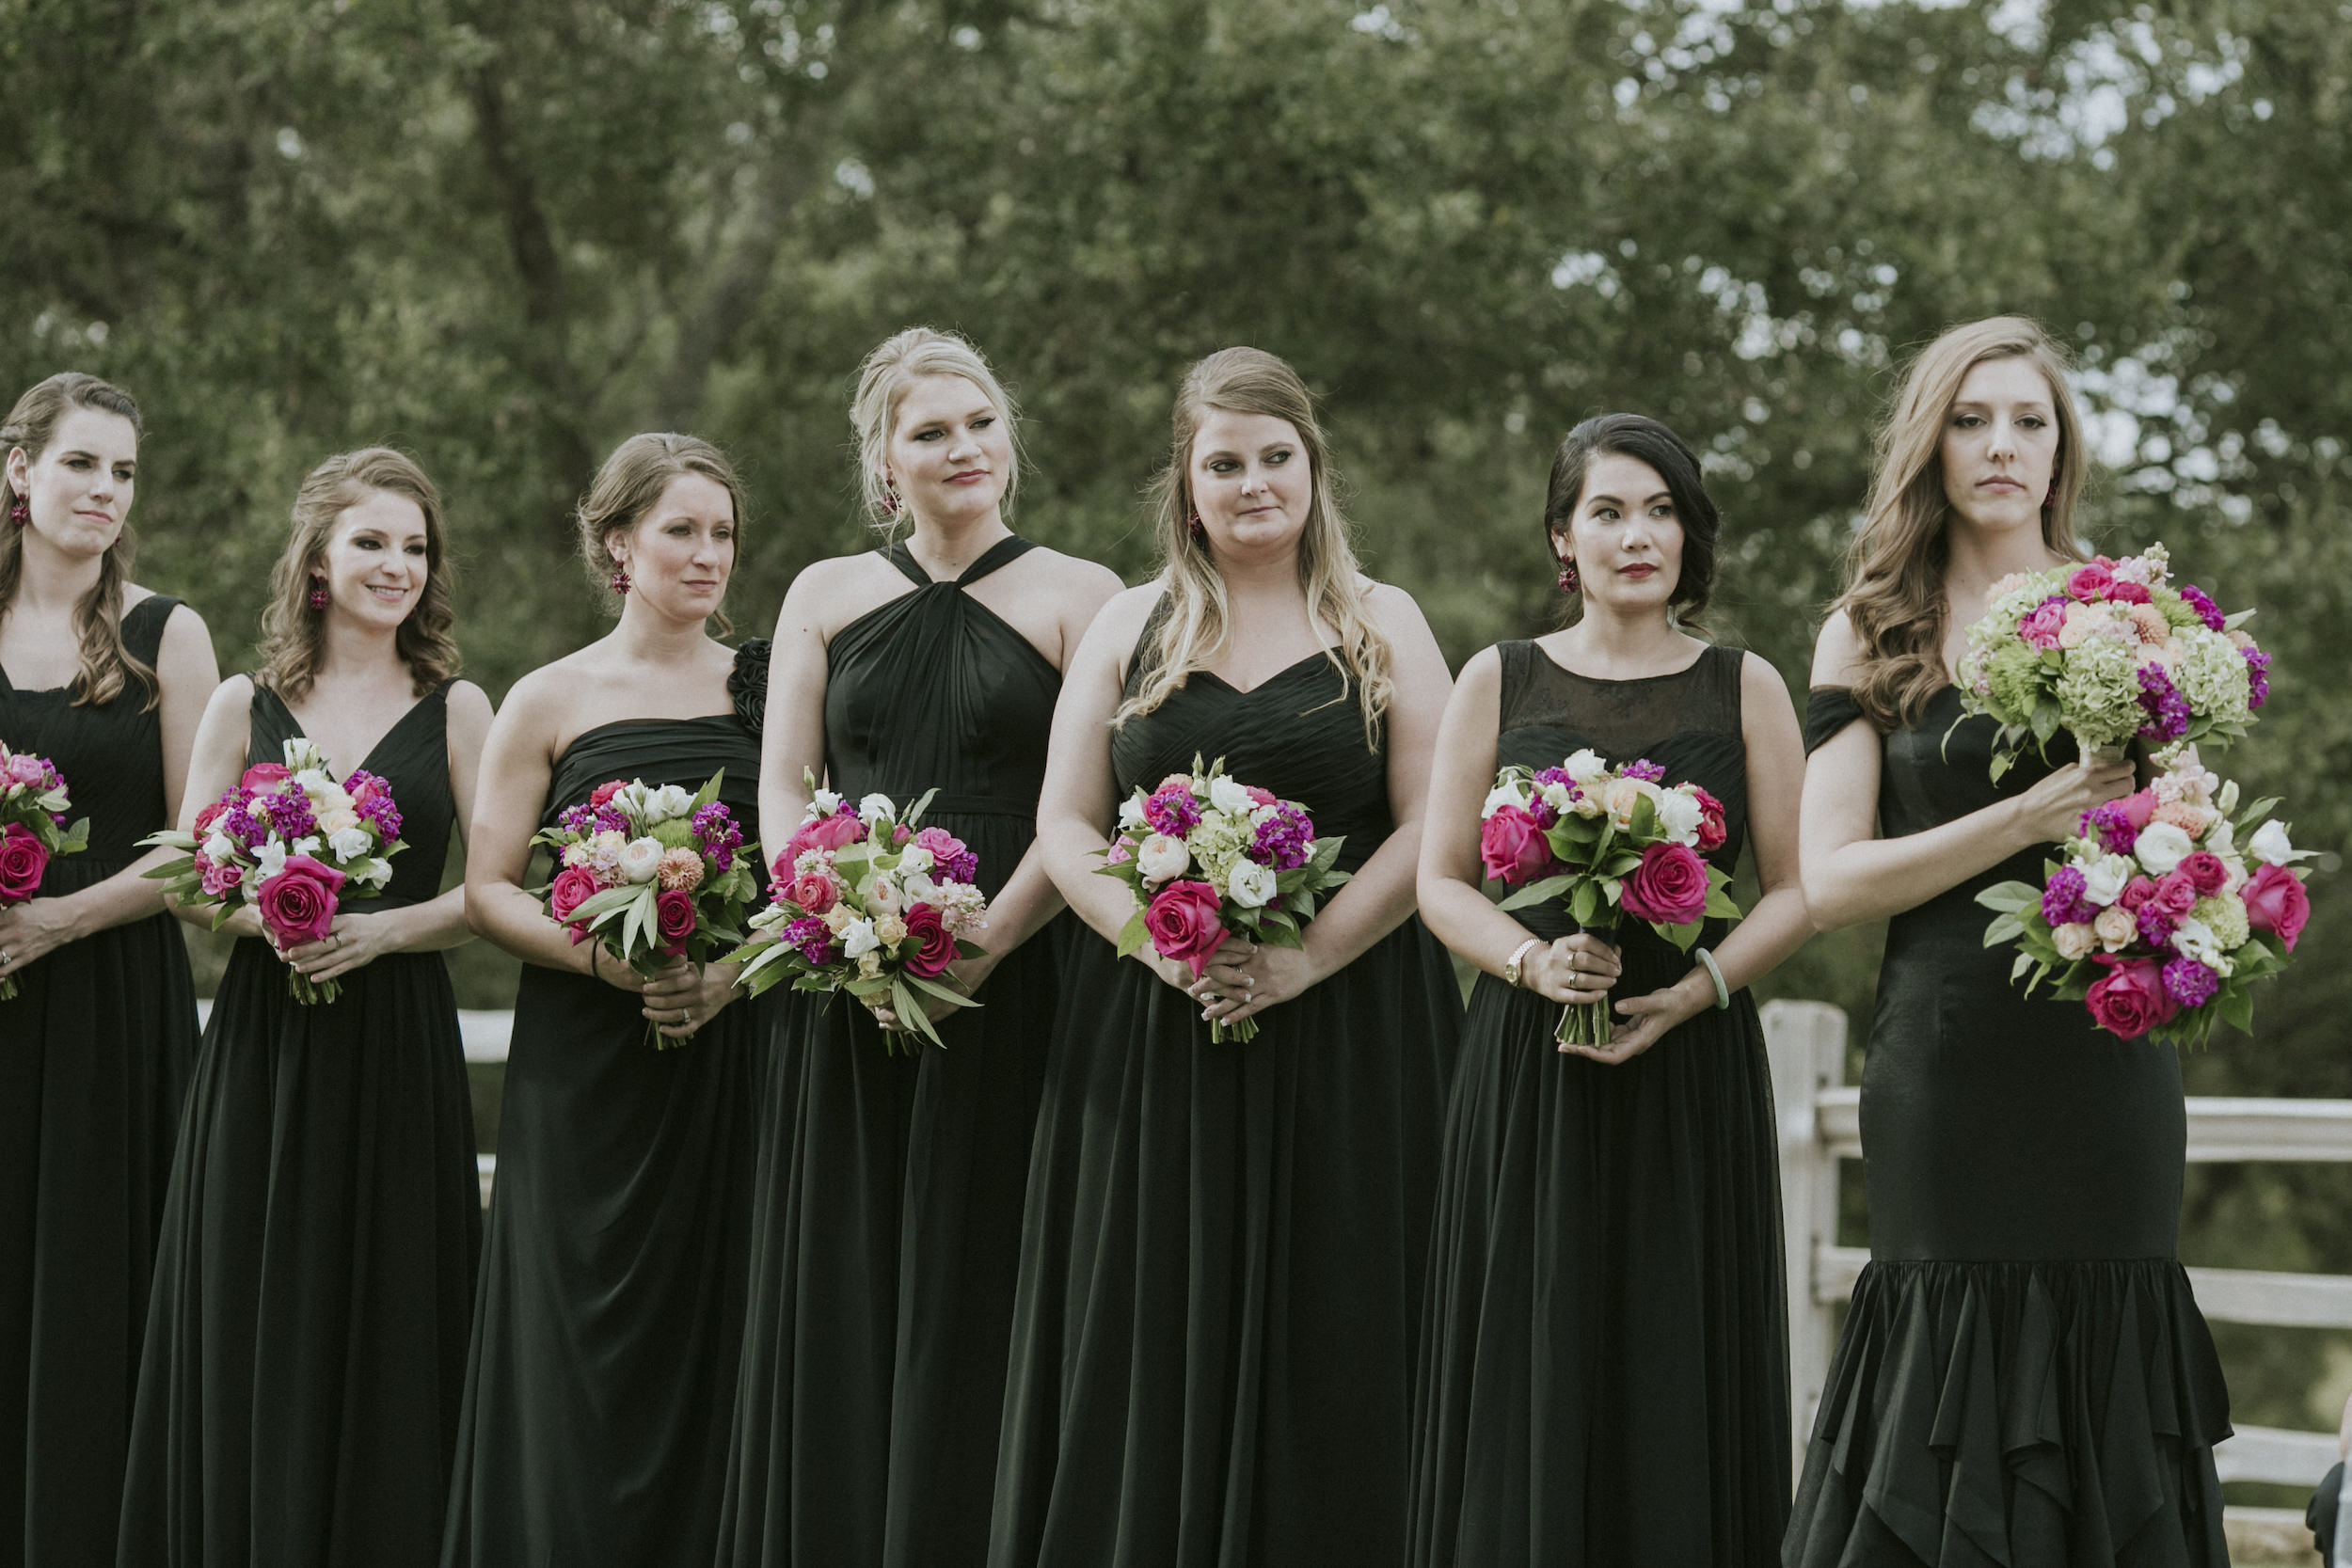 Garden Grove Wedding & Event Center5708.JPG